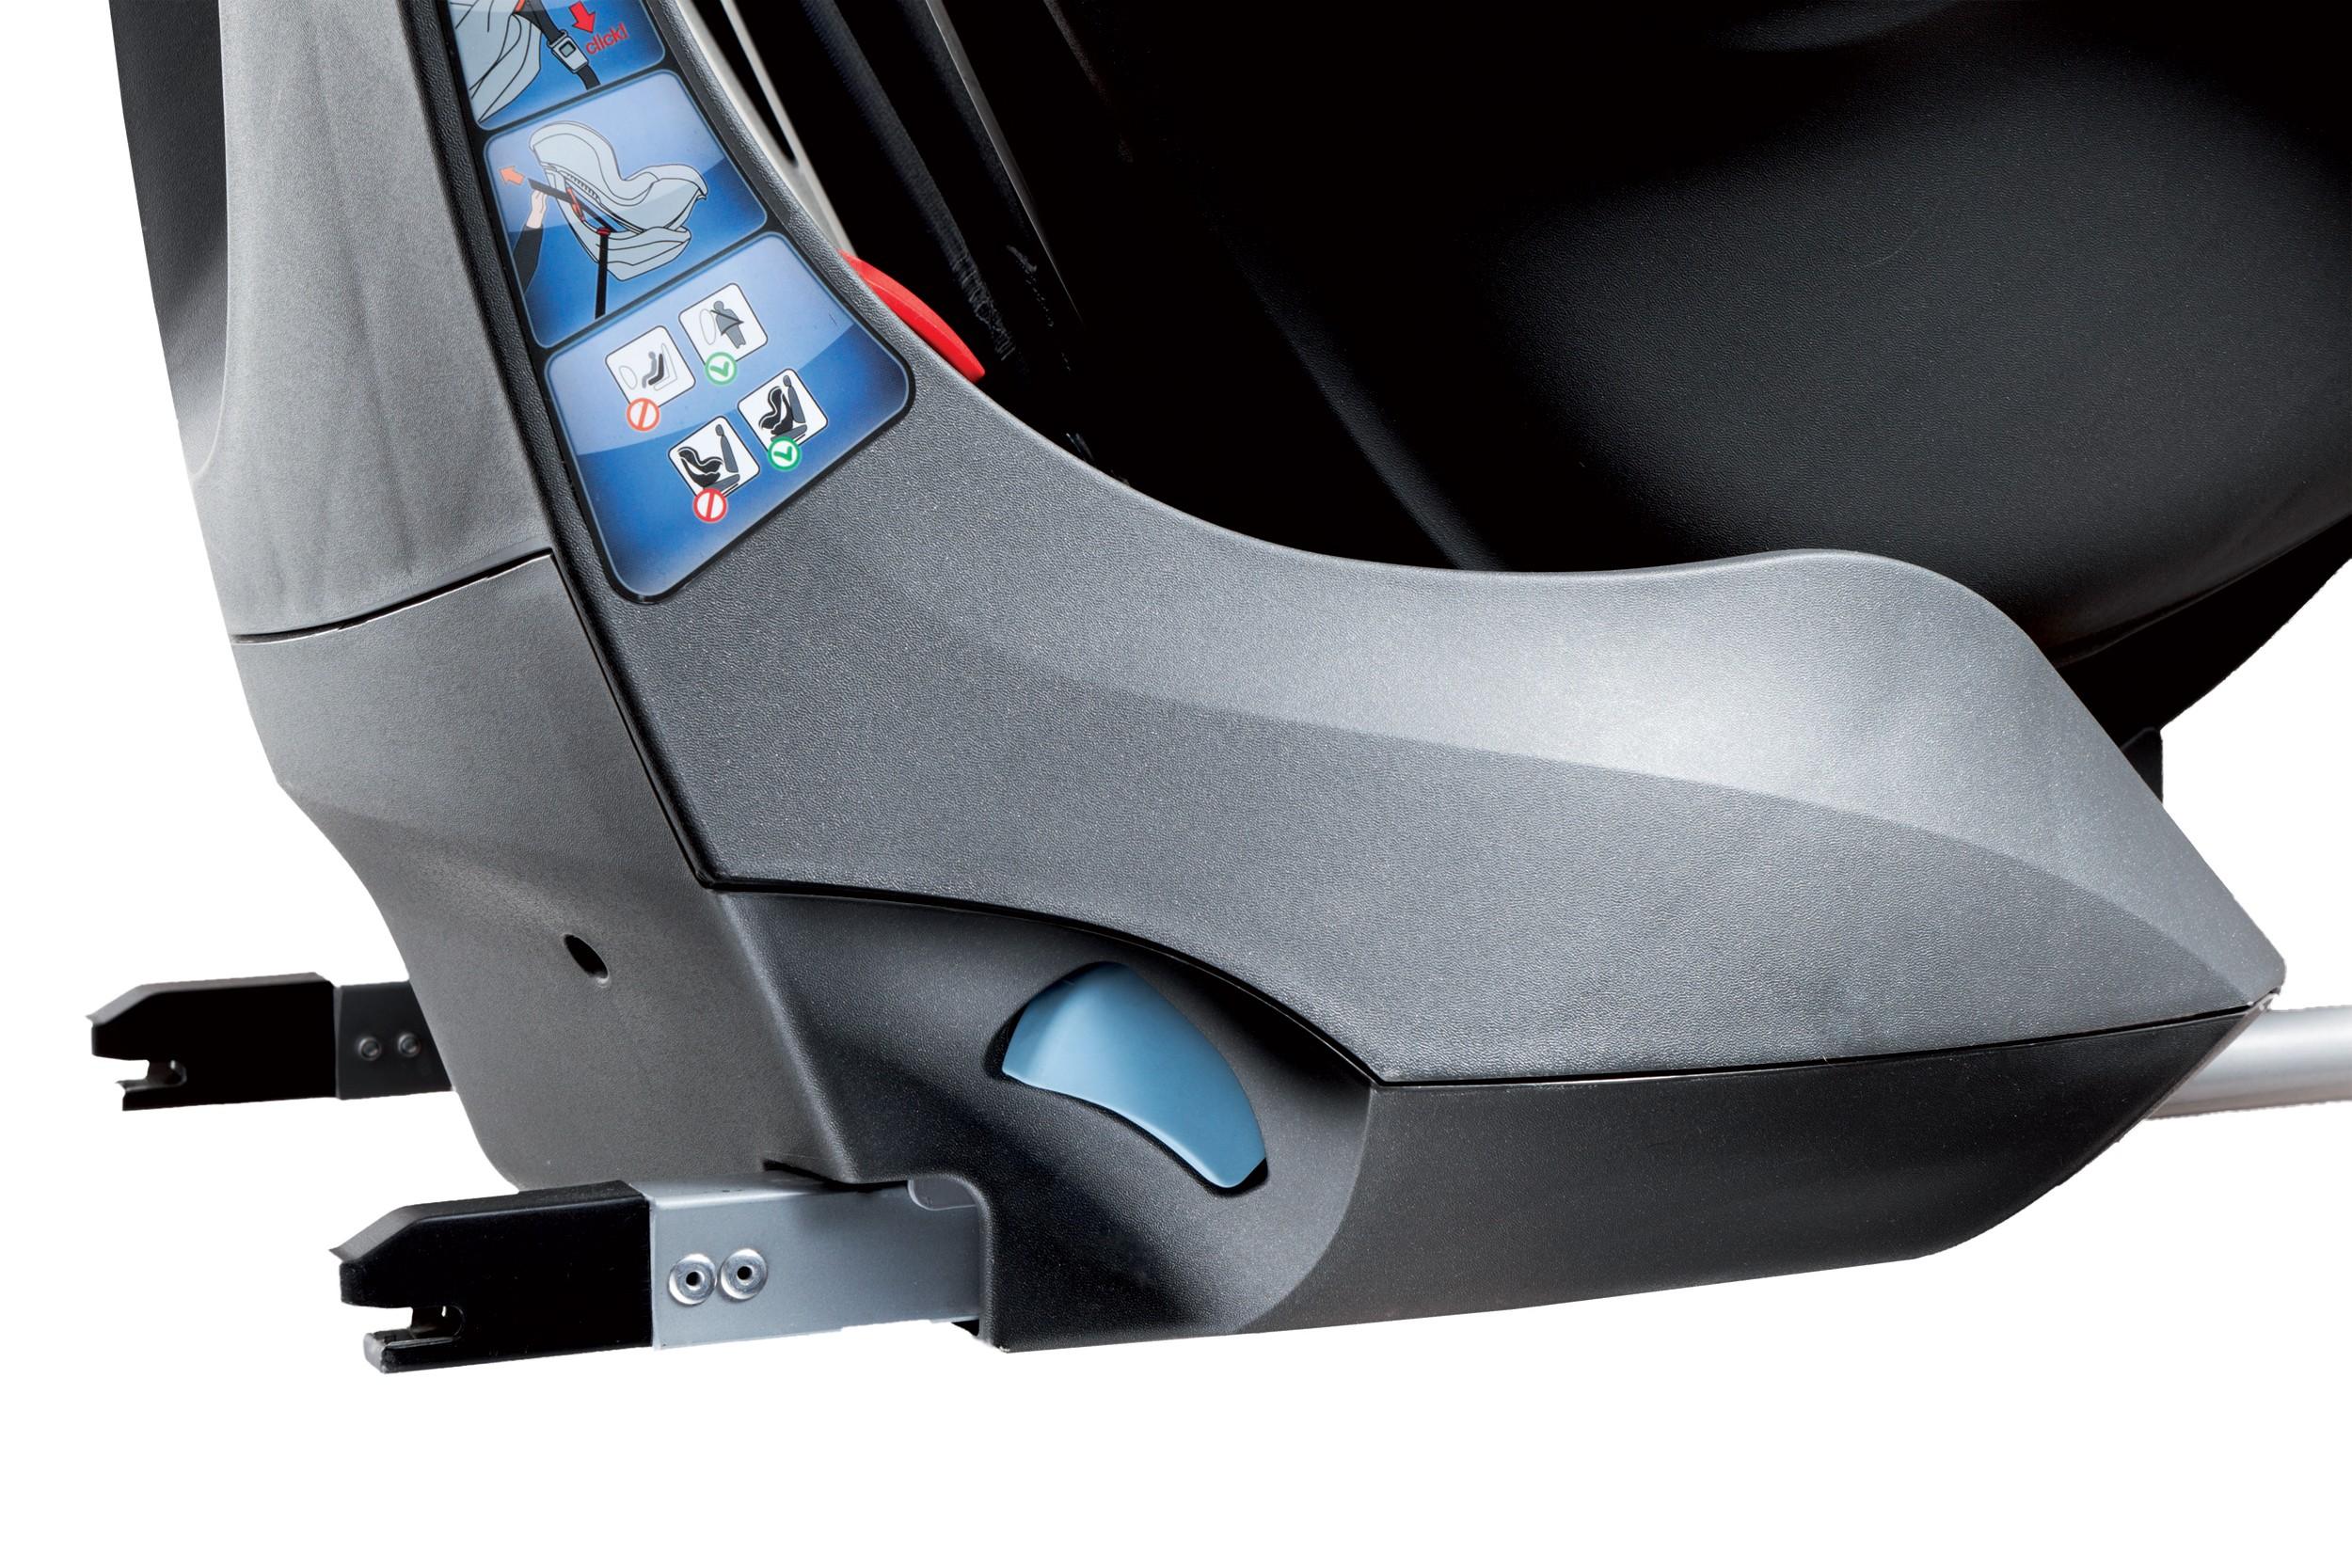 babytop24 kiwy autositz spf1 mit isofix und sa ats carbon. Black Bedroom Furniture Sets. Home Design Ideas